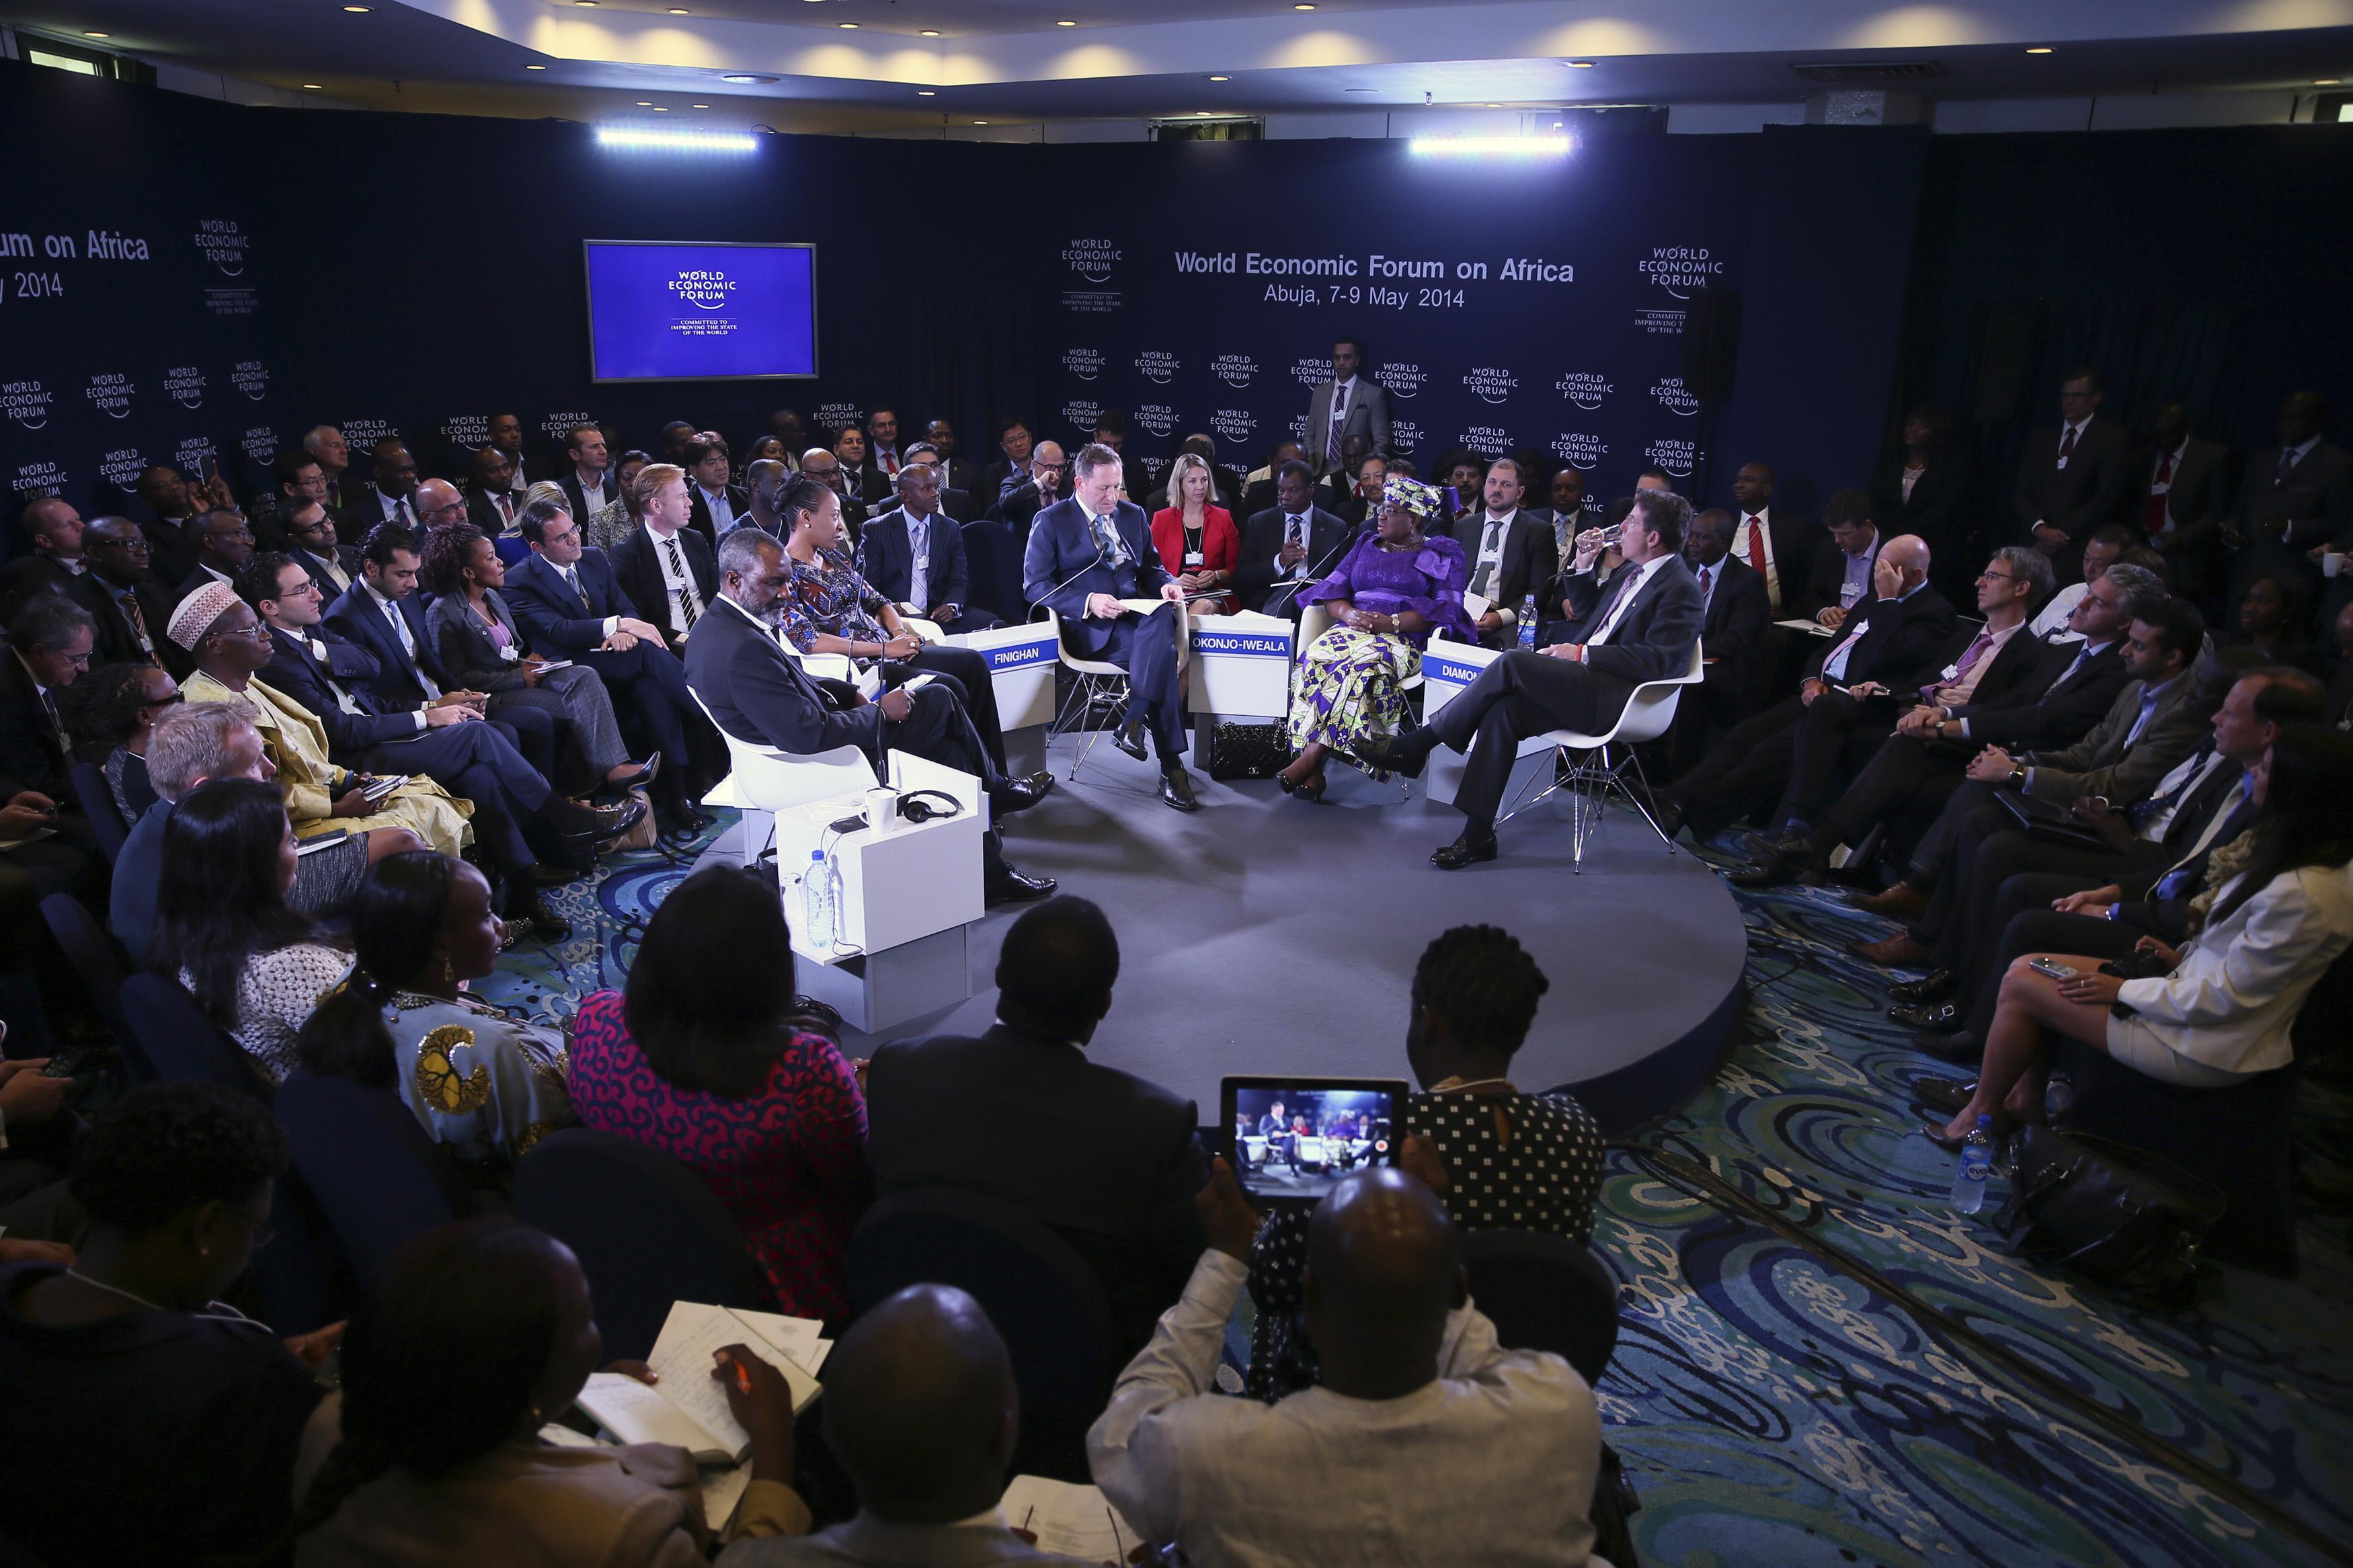 World Economic Forum On Africa Stark Contrasts Of Economic Growth